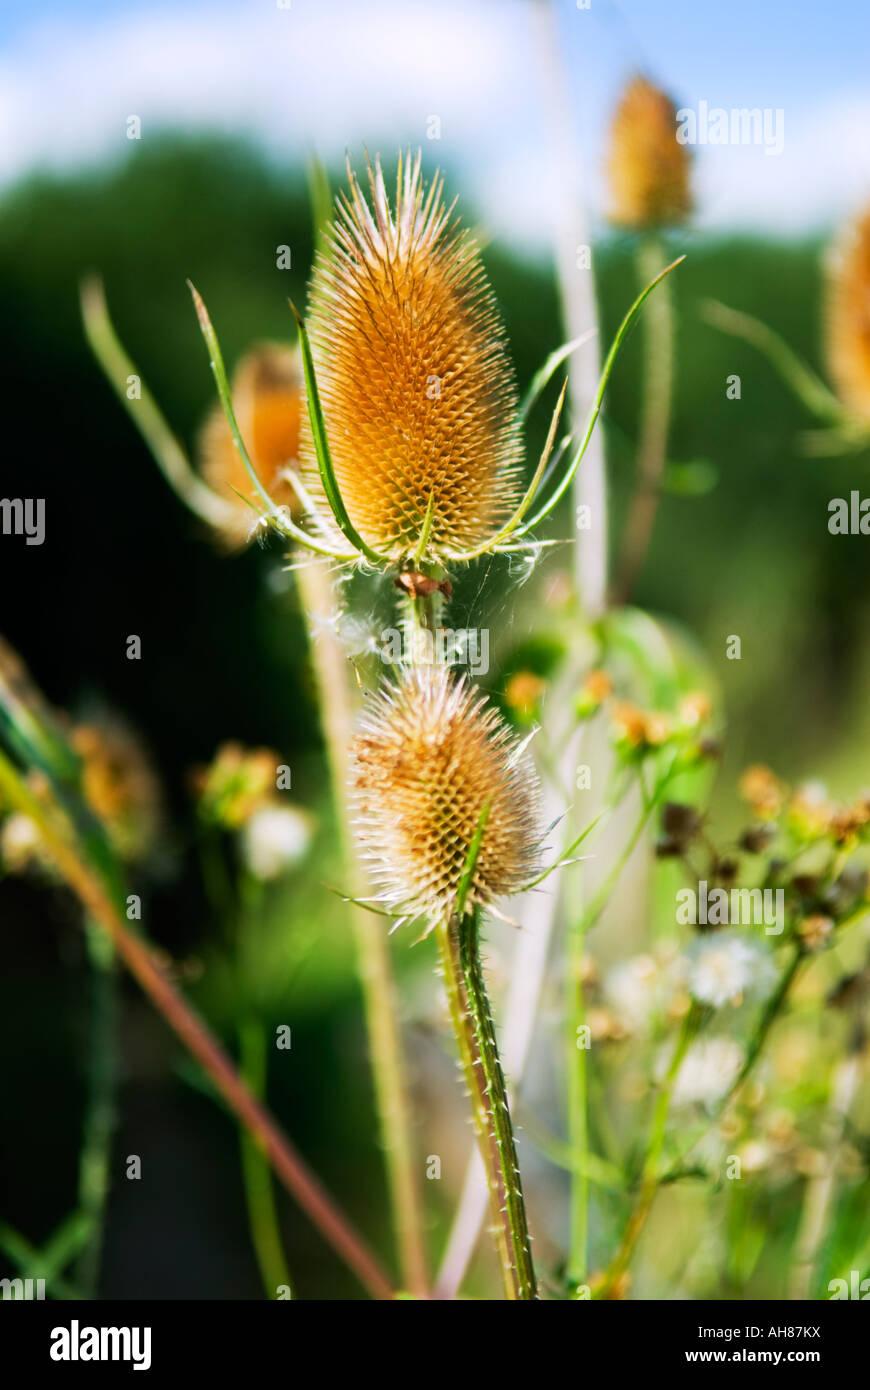 Teasel Plant Dispsacus Fullonum - Stock Image